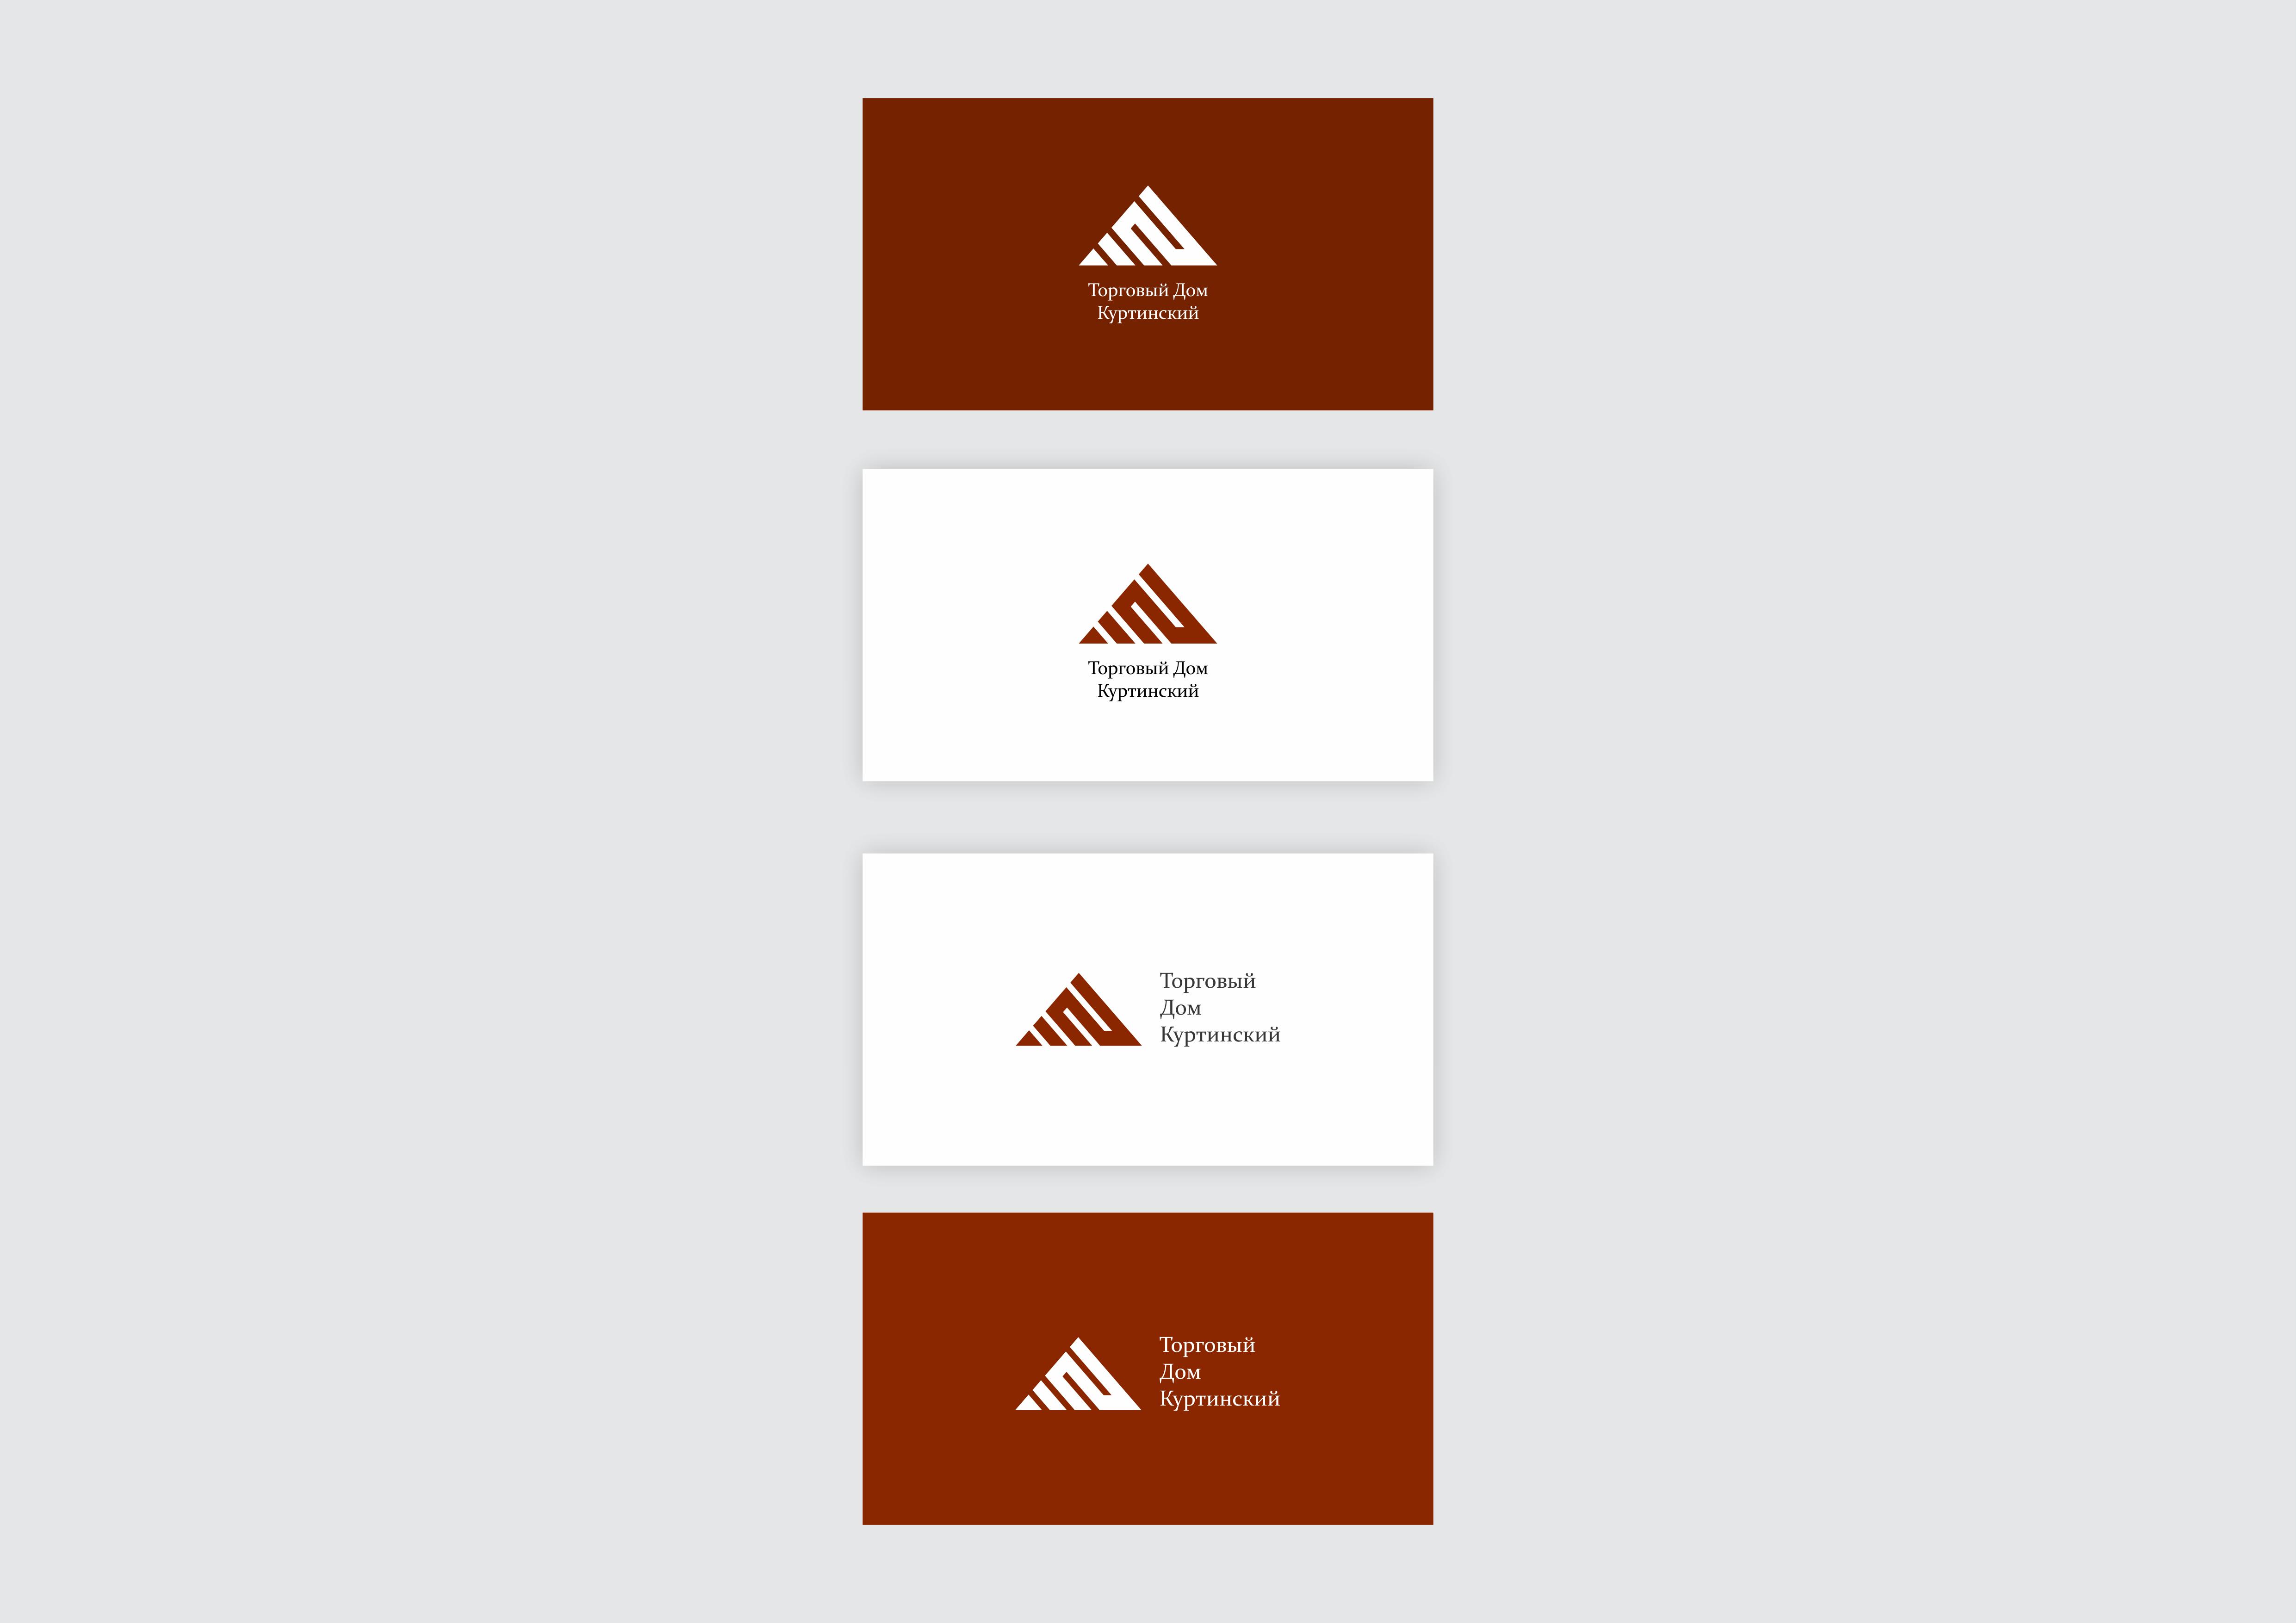 Логотип для камнедобывающей компании фото f_5935b98b999aa23f.png